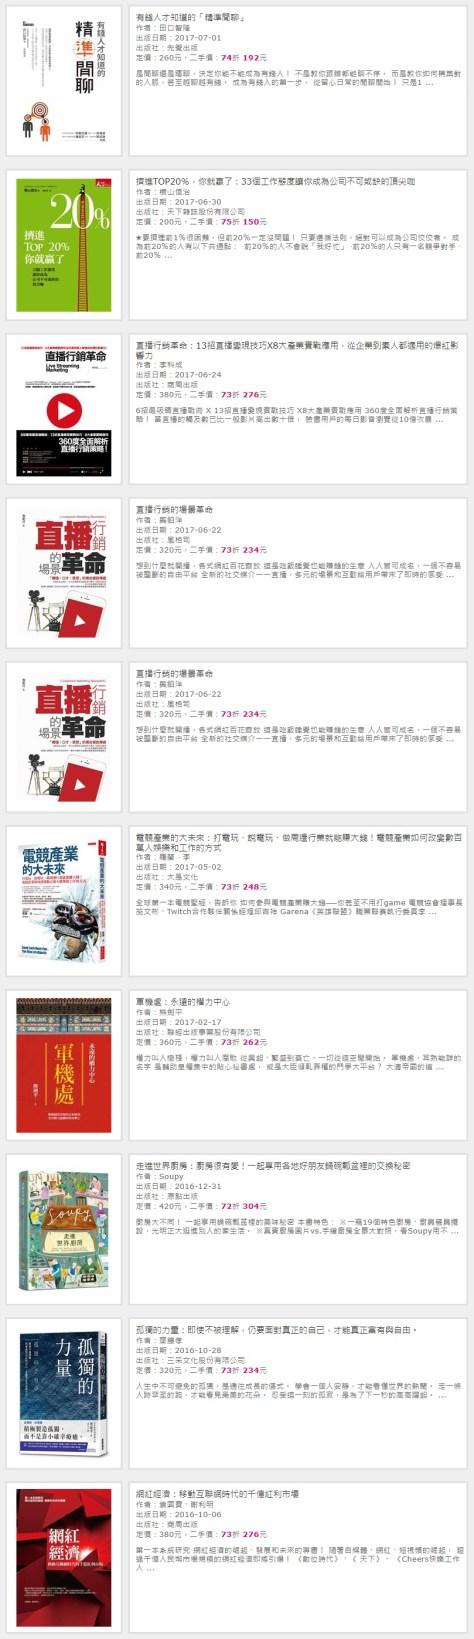 FireShot Capture 030 TAAZE 讀冊生活 二手書店 Wayne www.taaze .tw